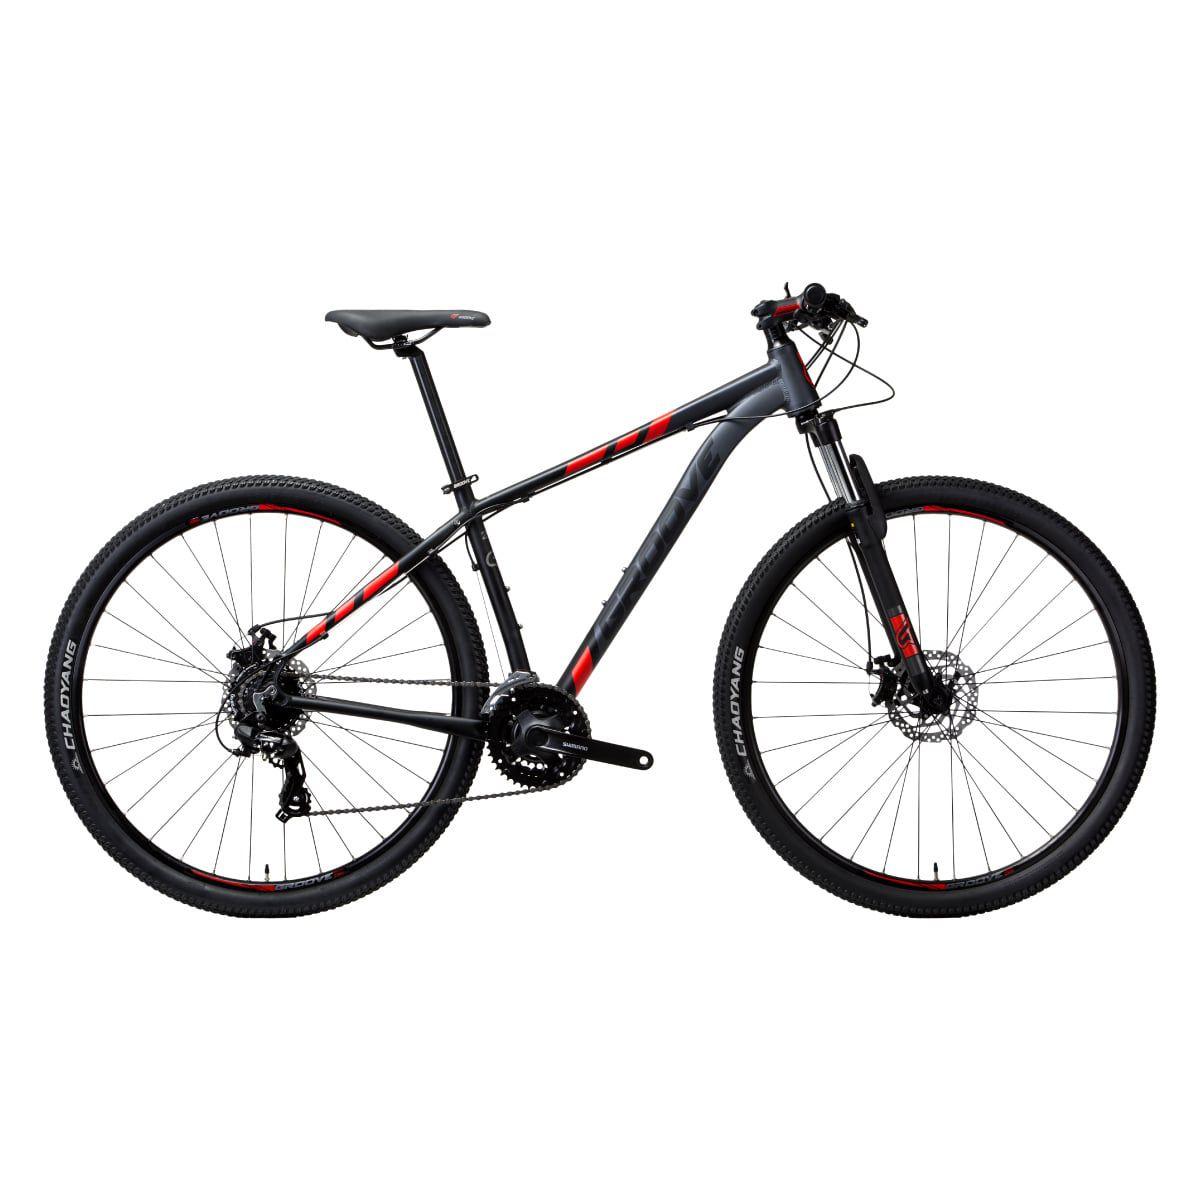 Bike Groove Hype 50 2019 Aro 29 24V Shimano